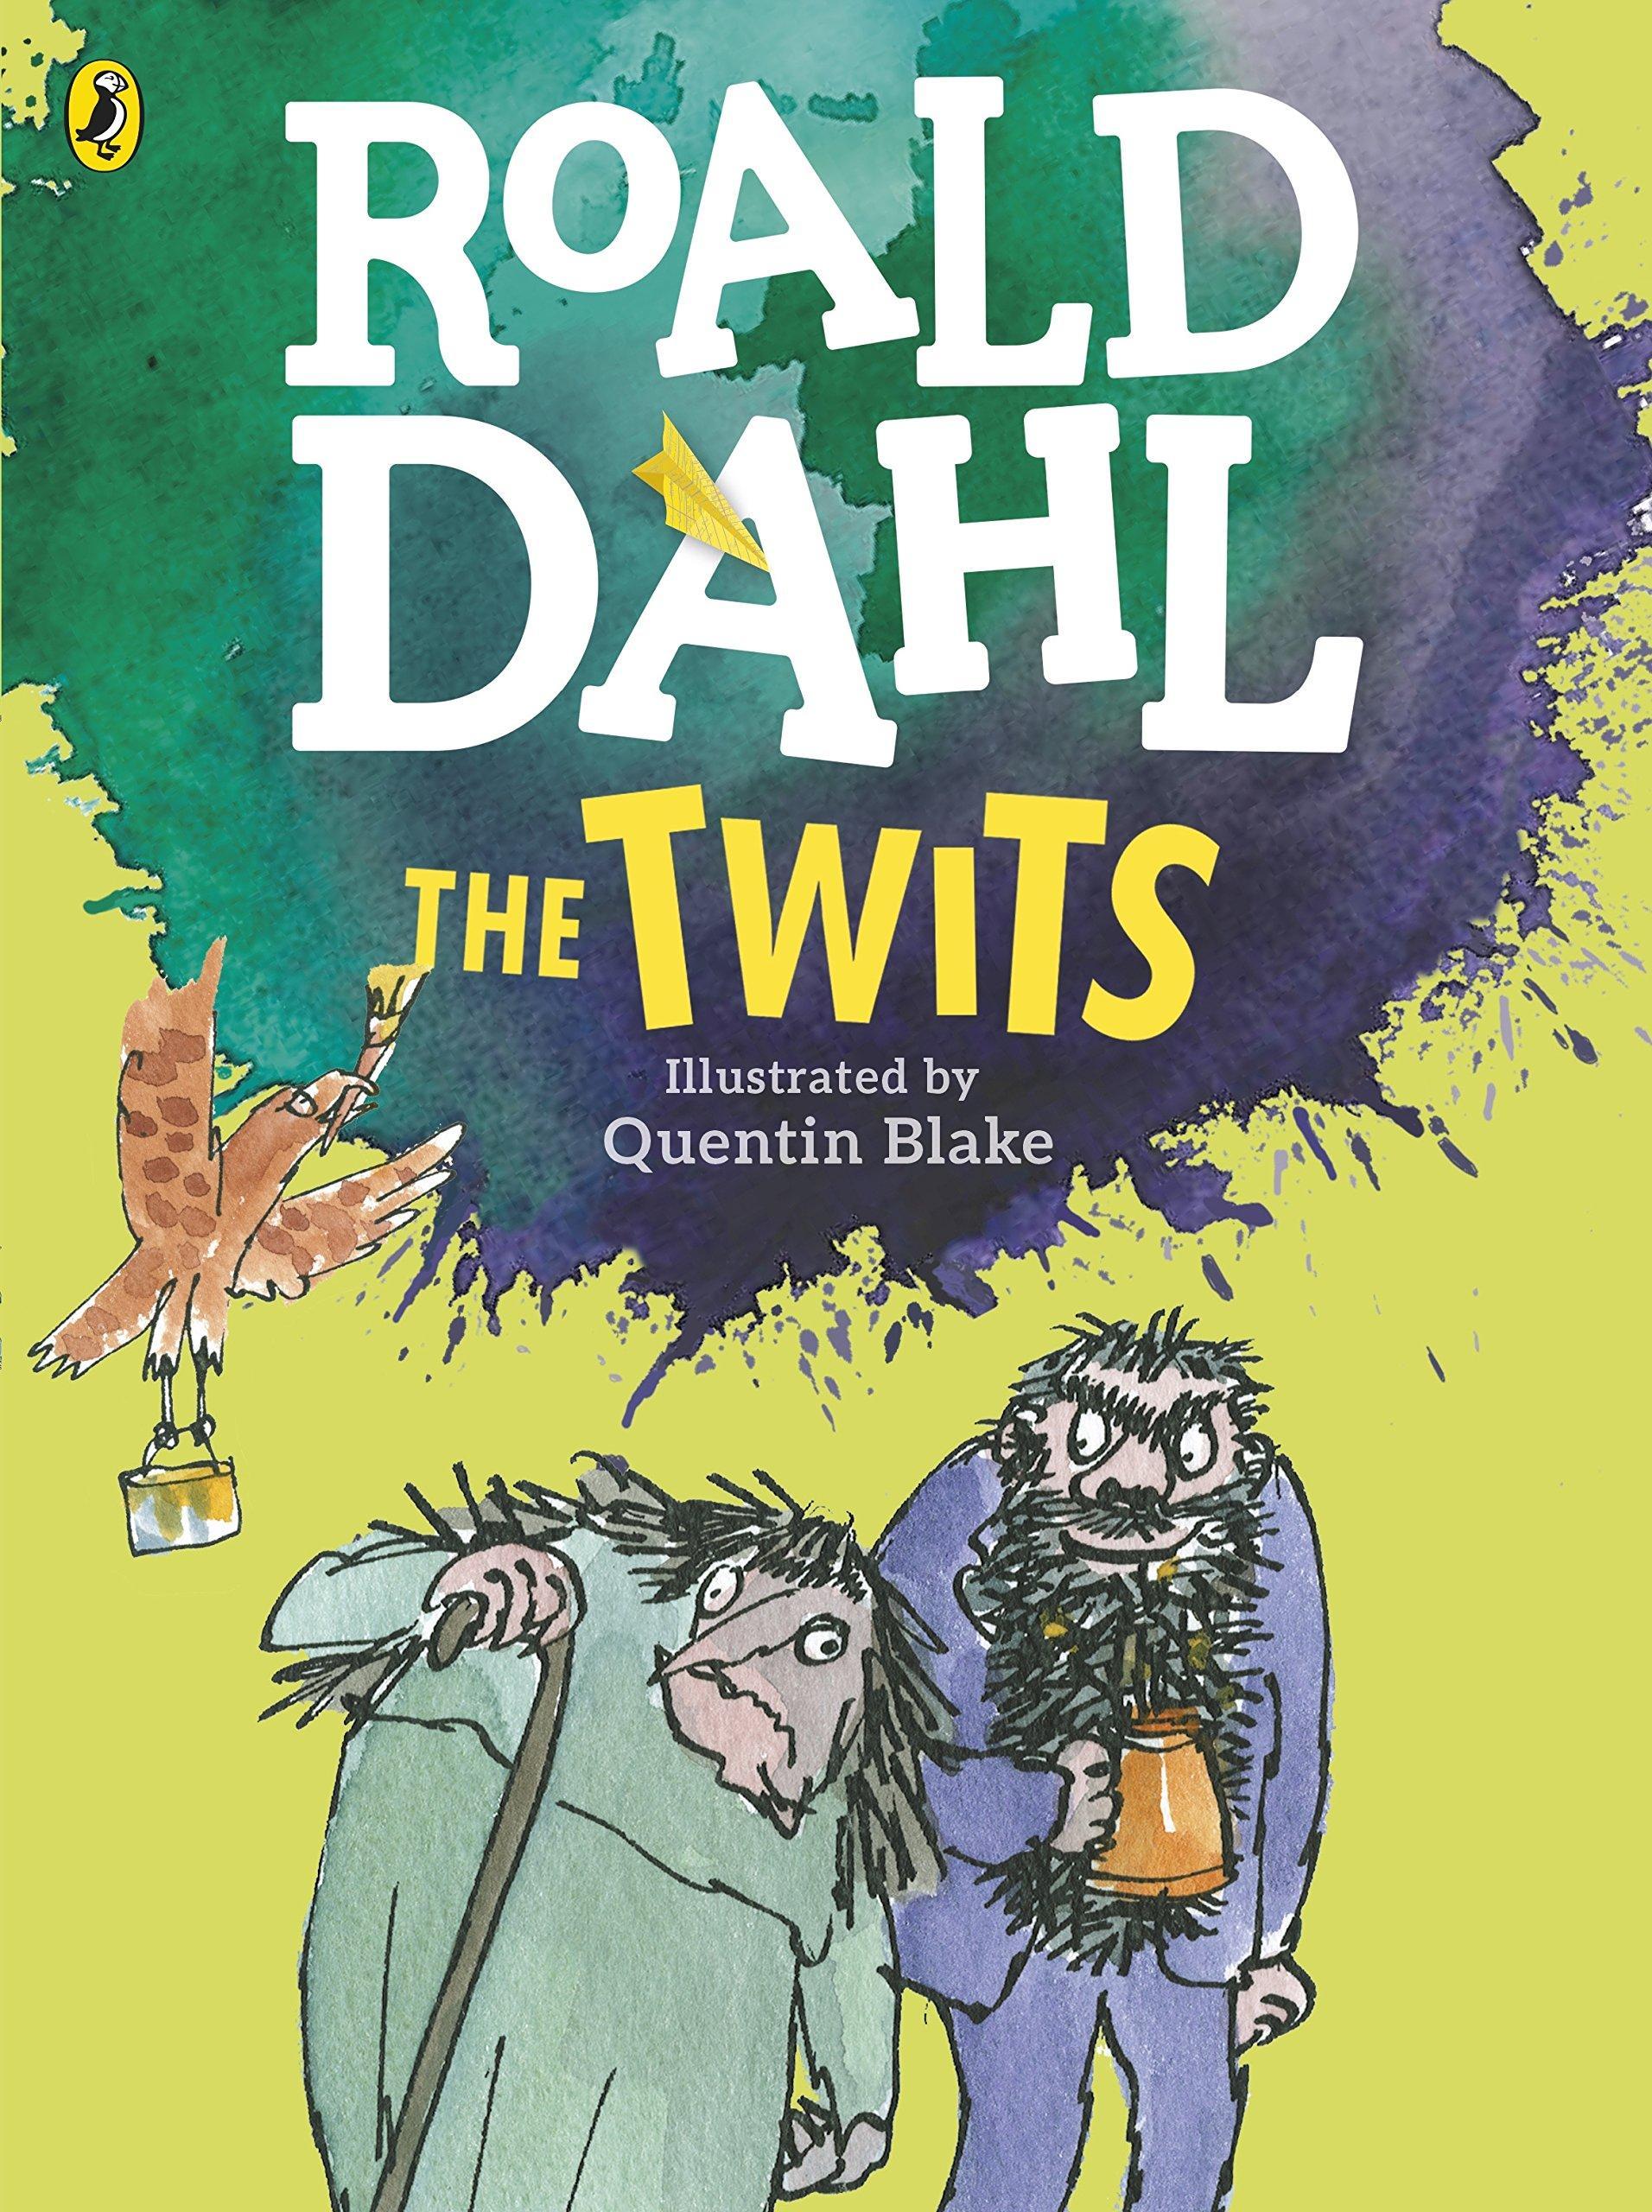 [Roald Dahl] The Twits